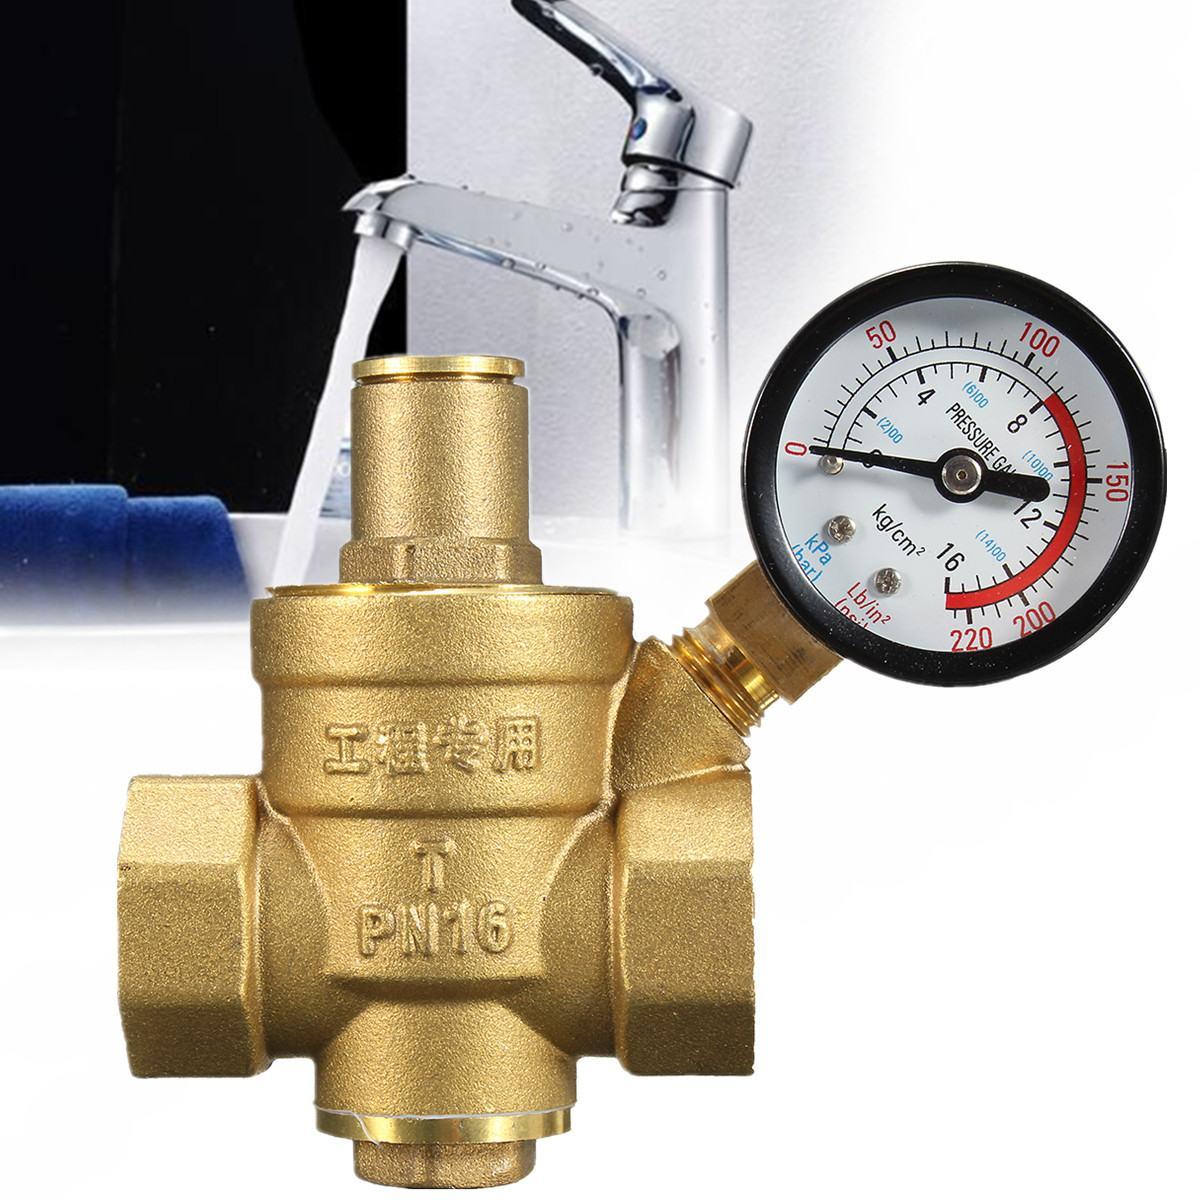 DN20 NPT 3/4'' Regulator Brass Water Pressure Regulator Reducer PN 1.6 Adjustable With Gauge Meter For Hydraulic/Water Purifier